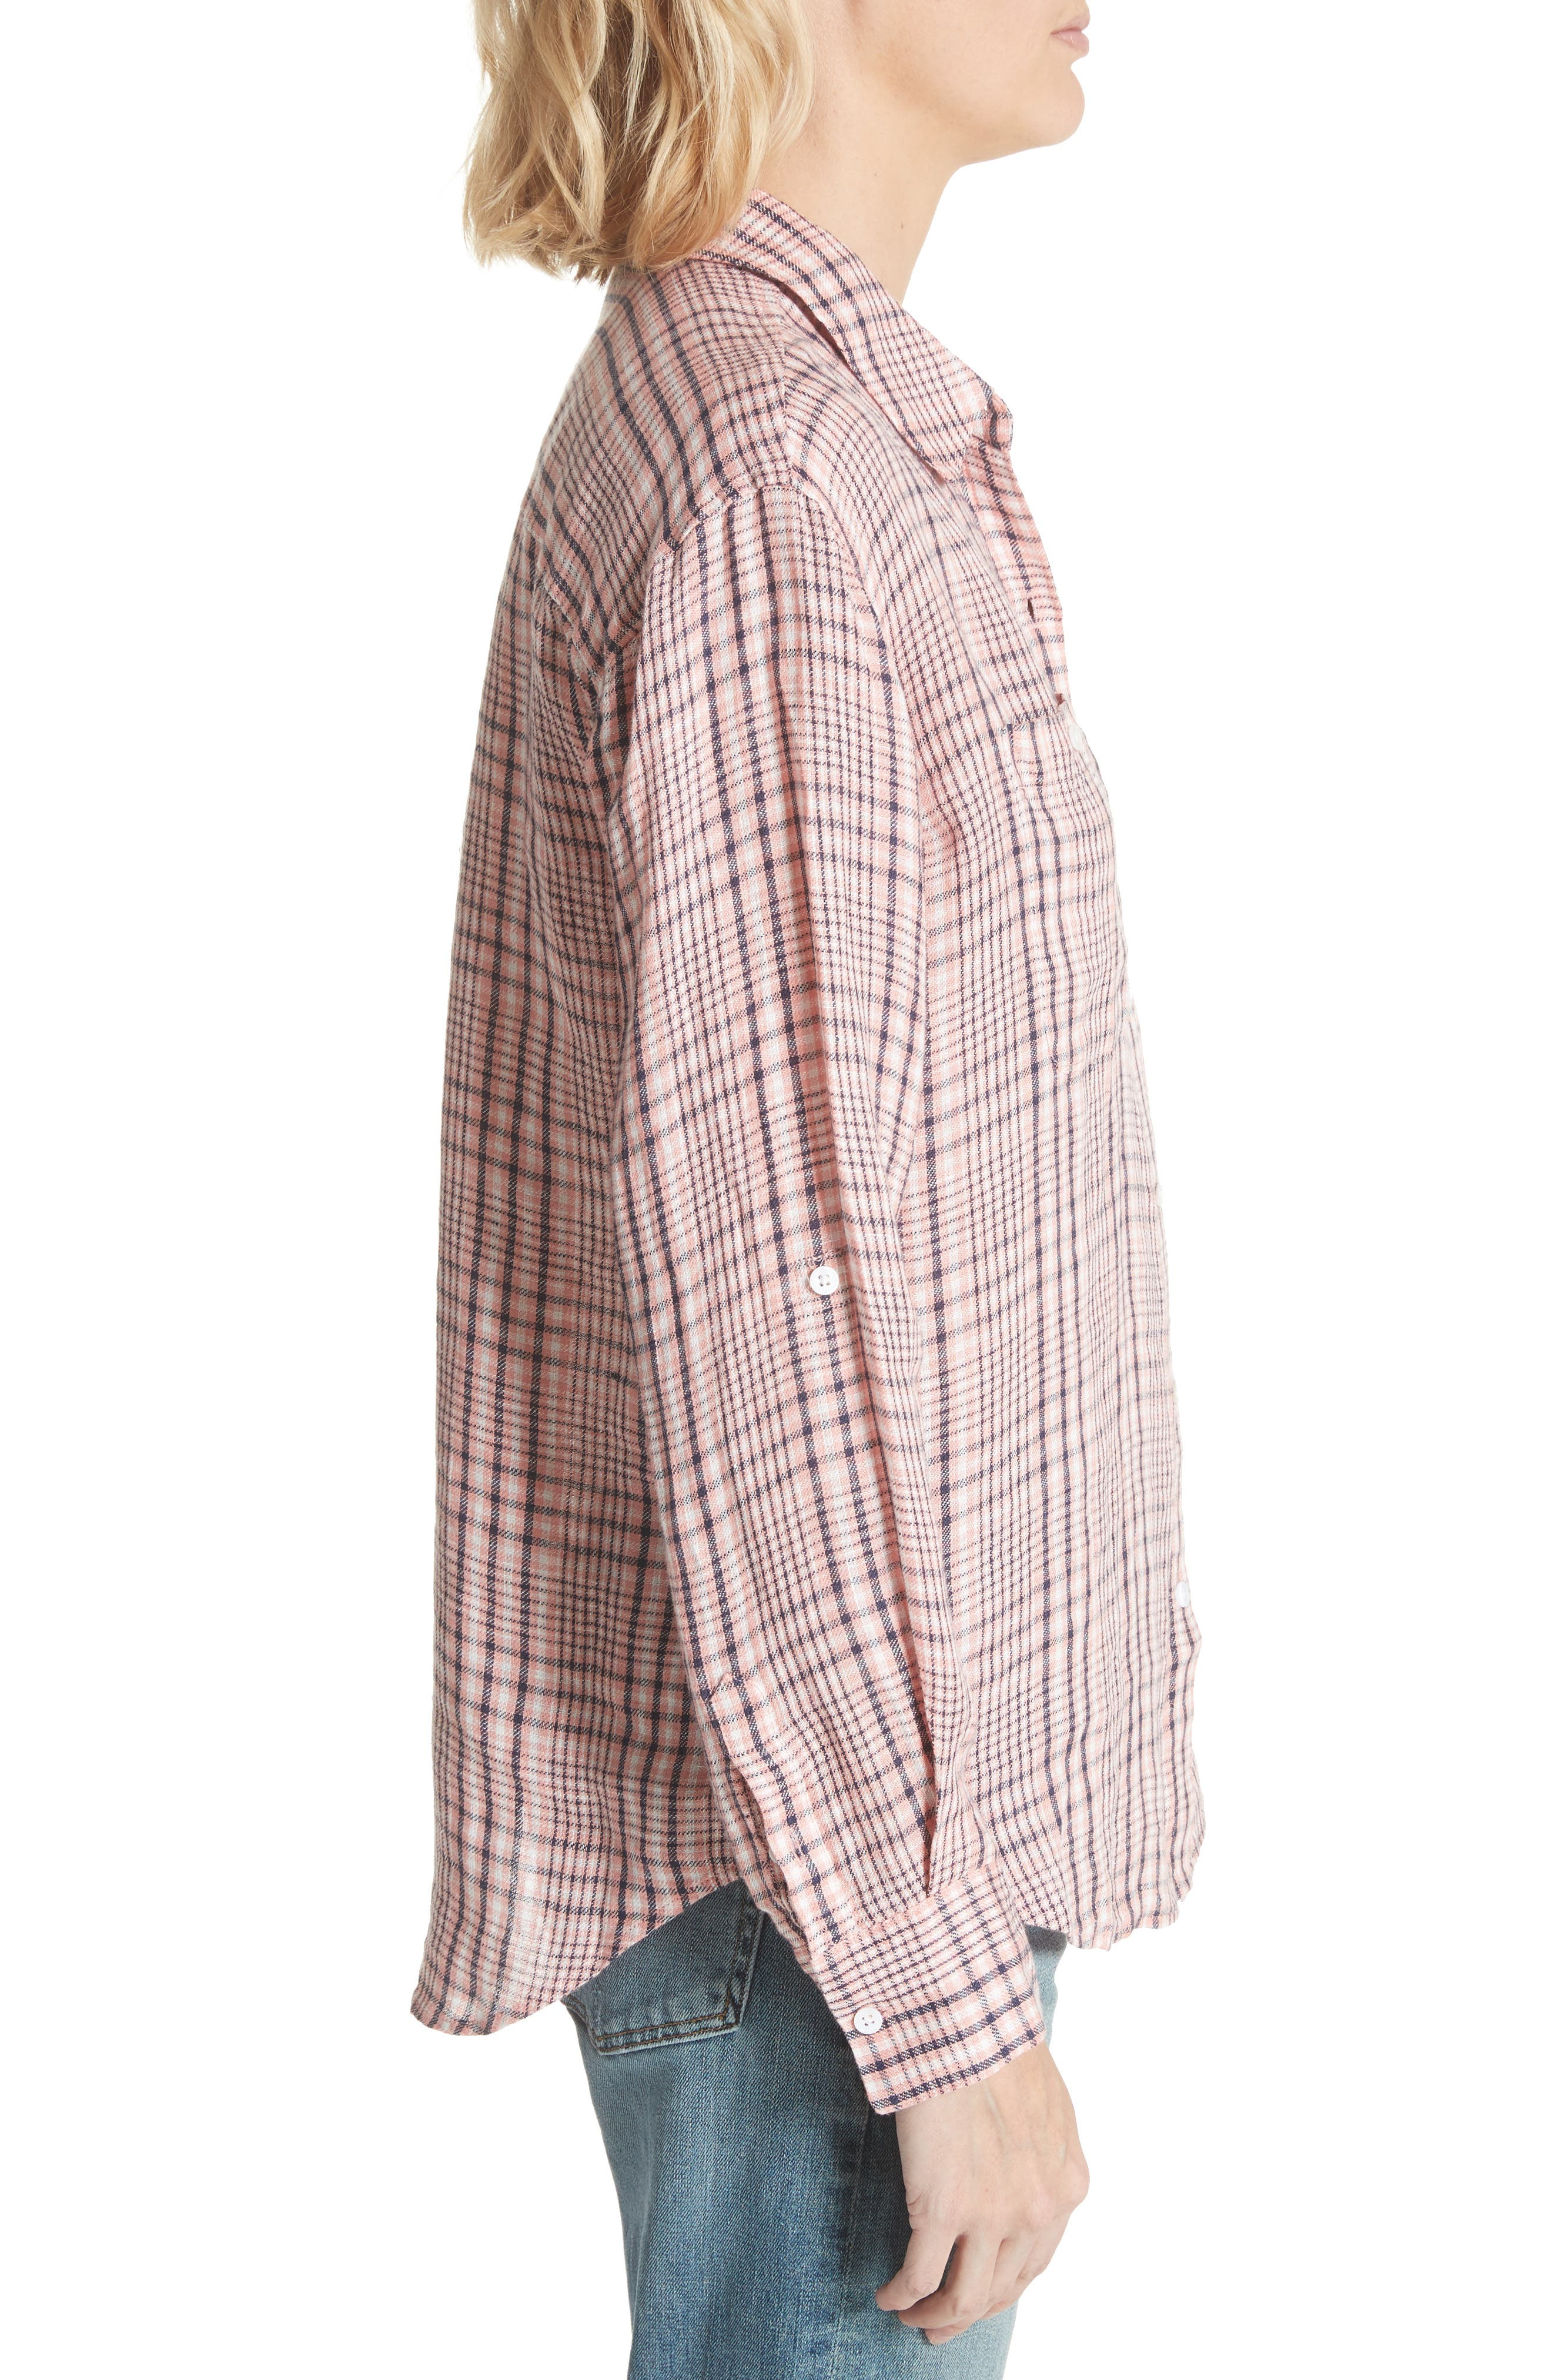 Lidelle Plaid Linen Shirt,                             Alternate thumbnail 3, color,                             Baci